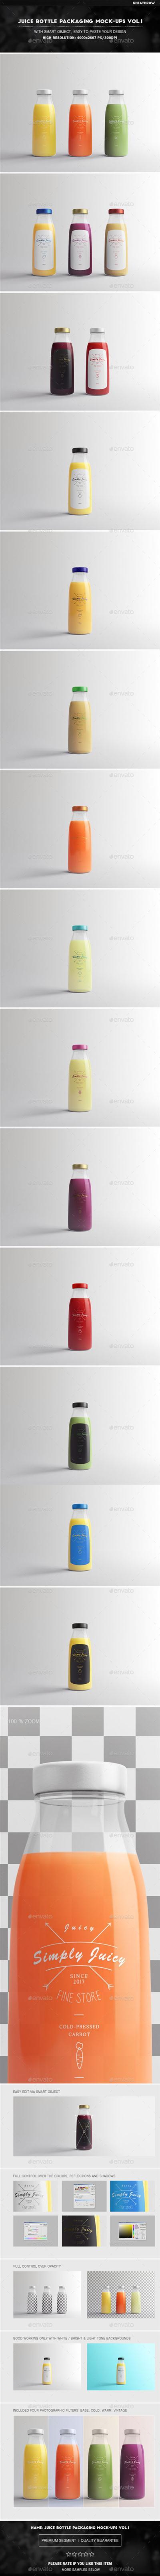 Juice Bottle Packaging Mock-Ups Vol.1 20136576